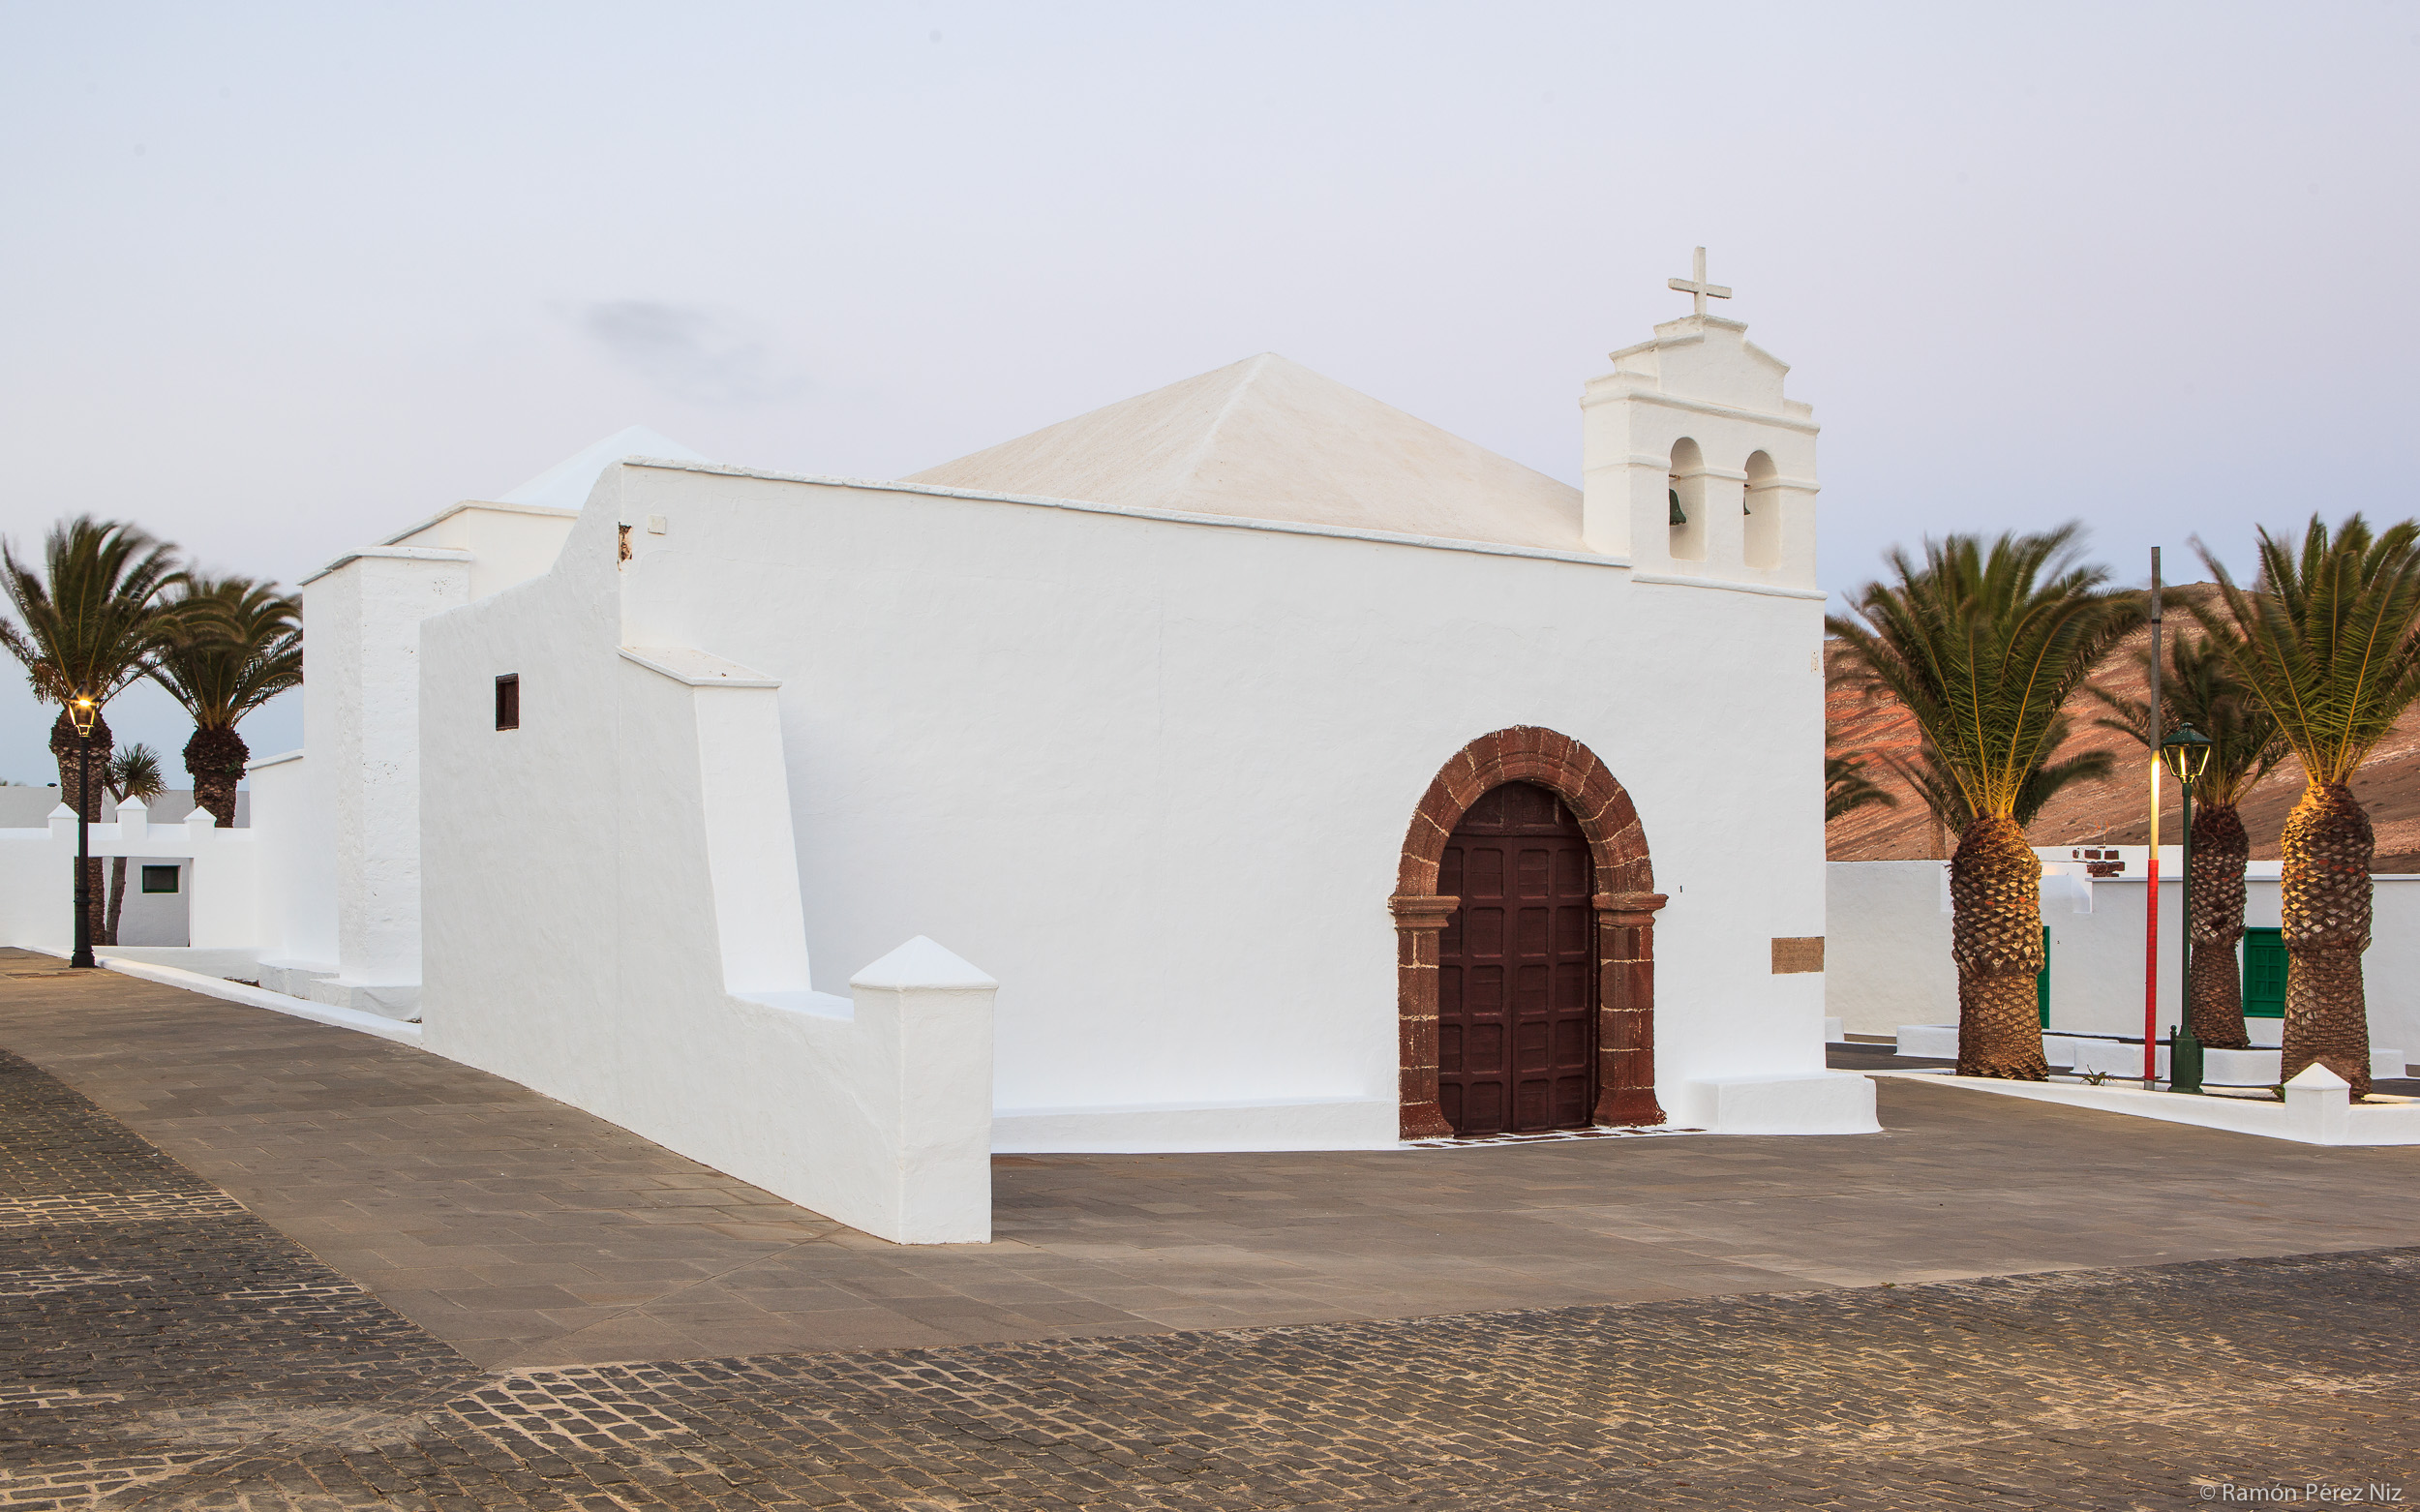 Foto de Ramón Pérez Niz, iglesia de Femés